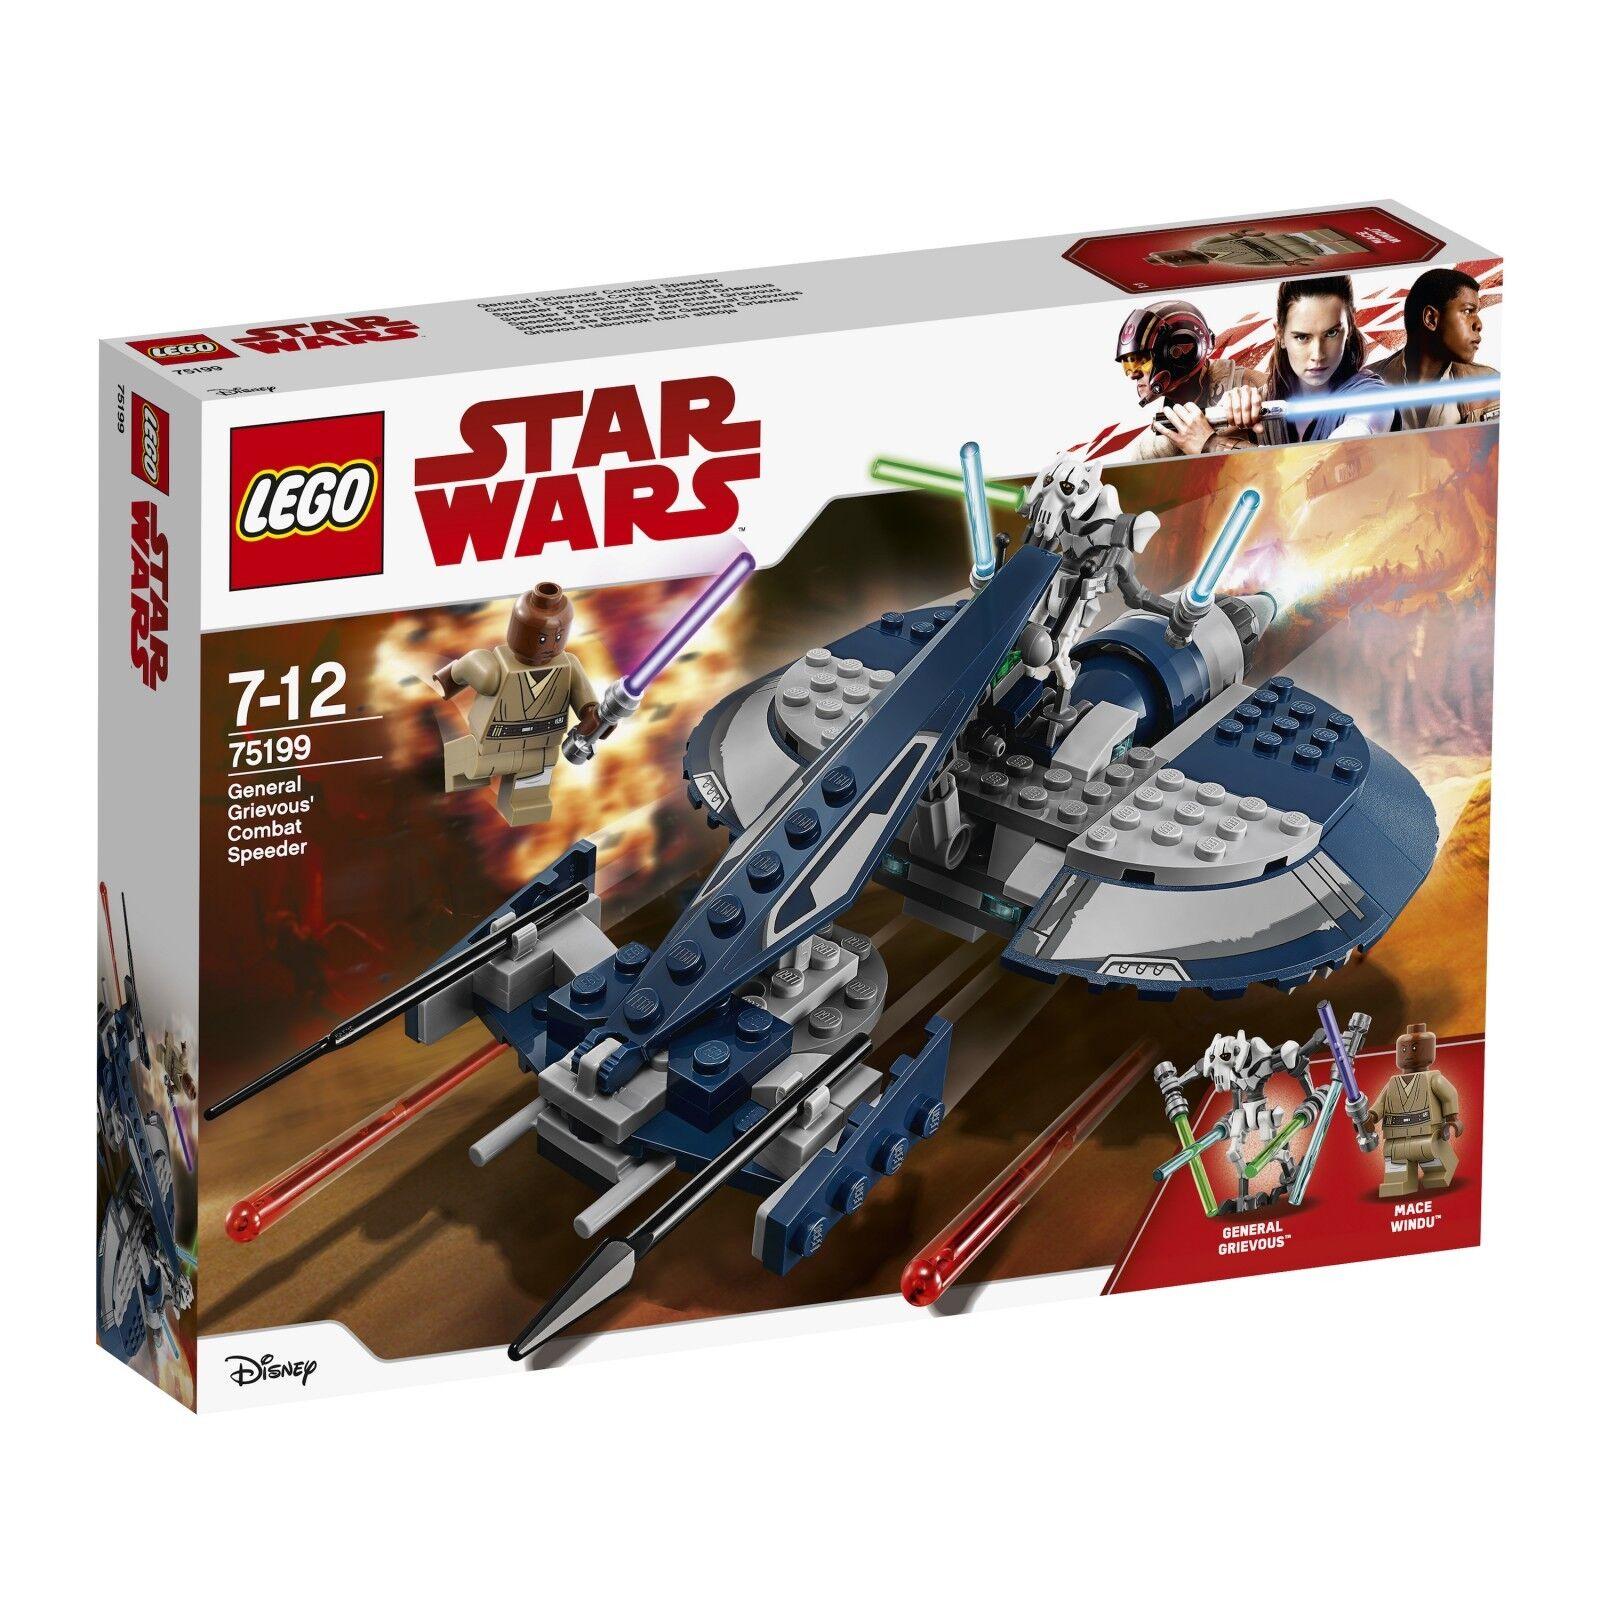 LEGO ® Star Wars ™ 75199 General Grievous Combat Speeder NUOVO OVP NEW MISB NRFB